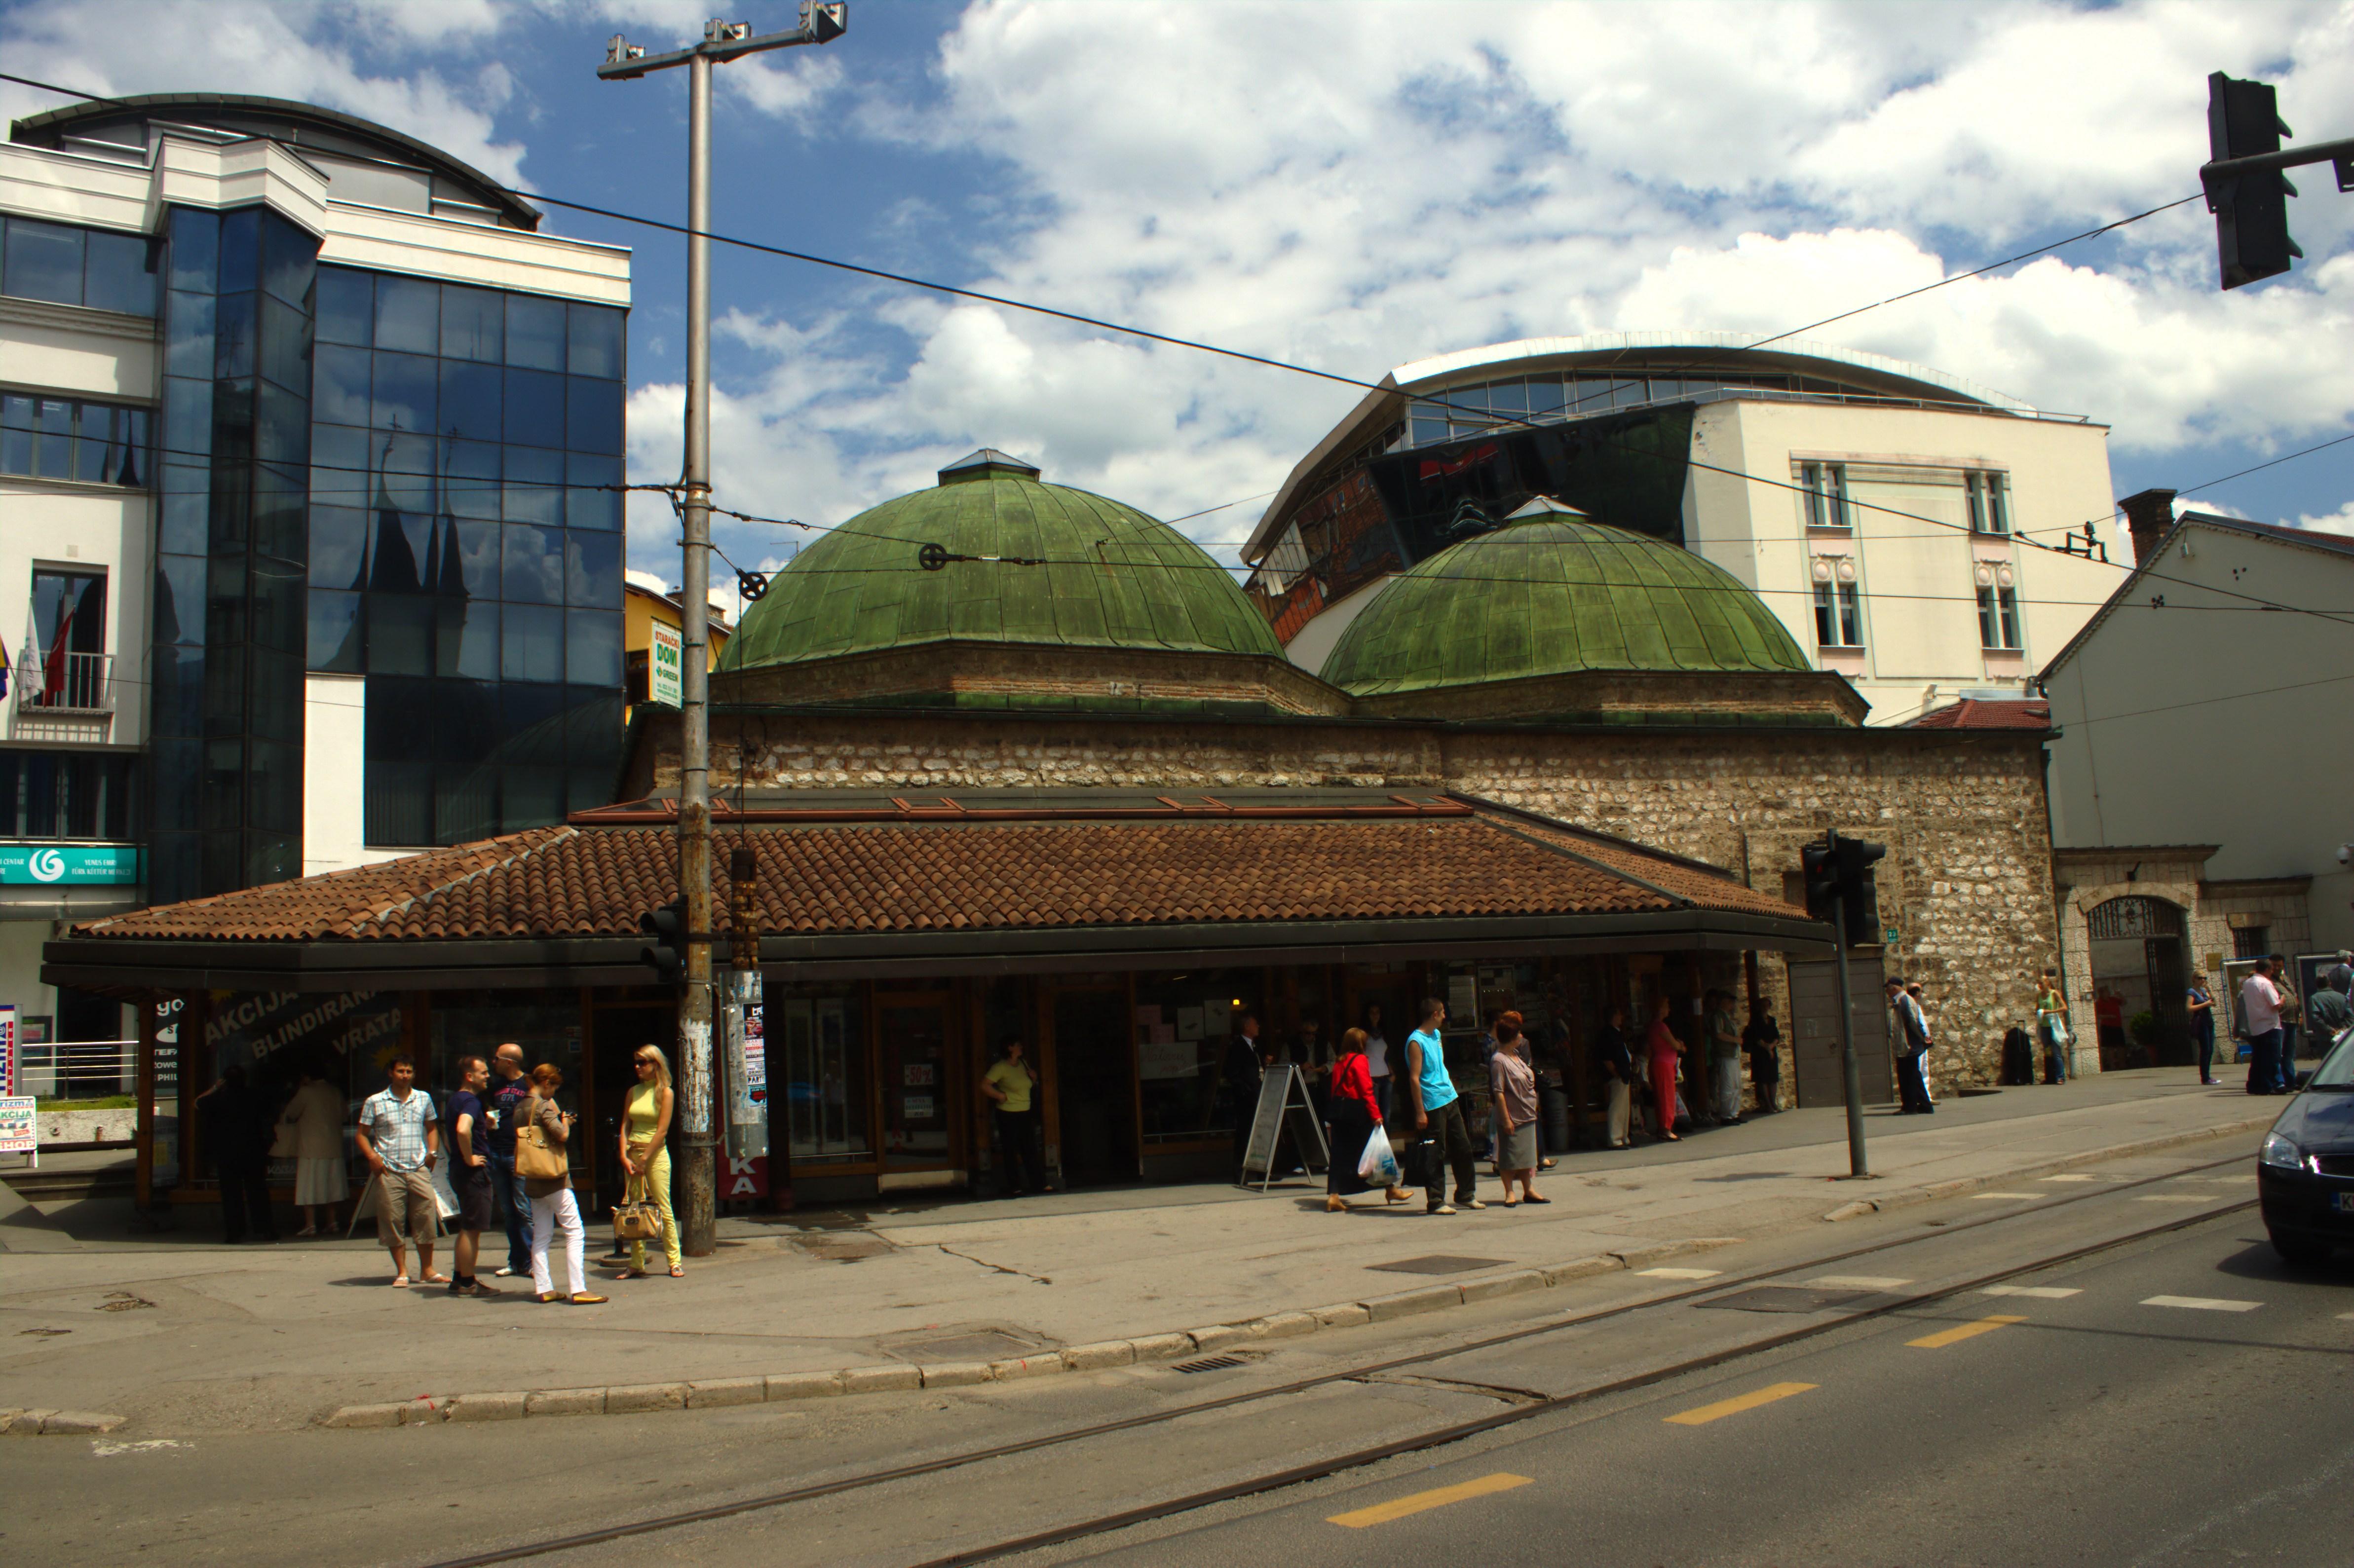 Bosniak institute (Bošnjački institut) i centrala Sarajevo (Baščaršija), BiH. Foto: Aktron CC BY 3.0